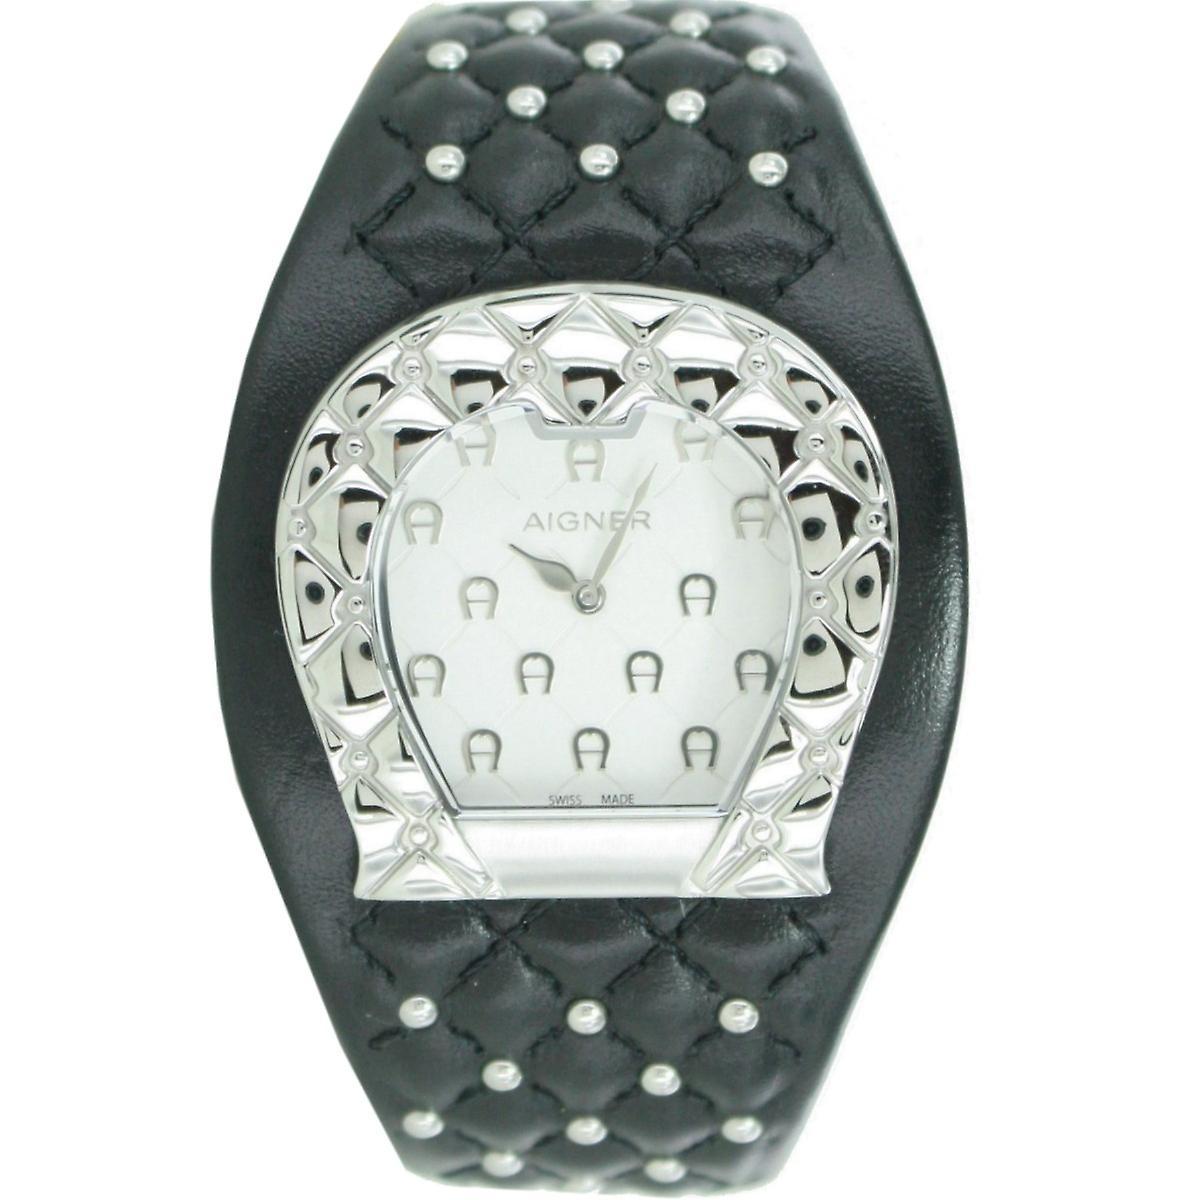 Aigner Damen Uhr Armbanduhr Lederband schwarz A41207